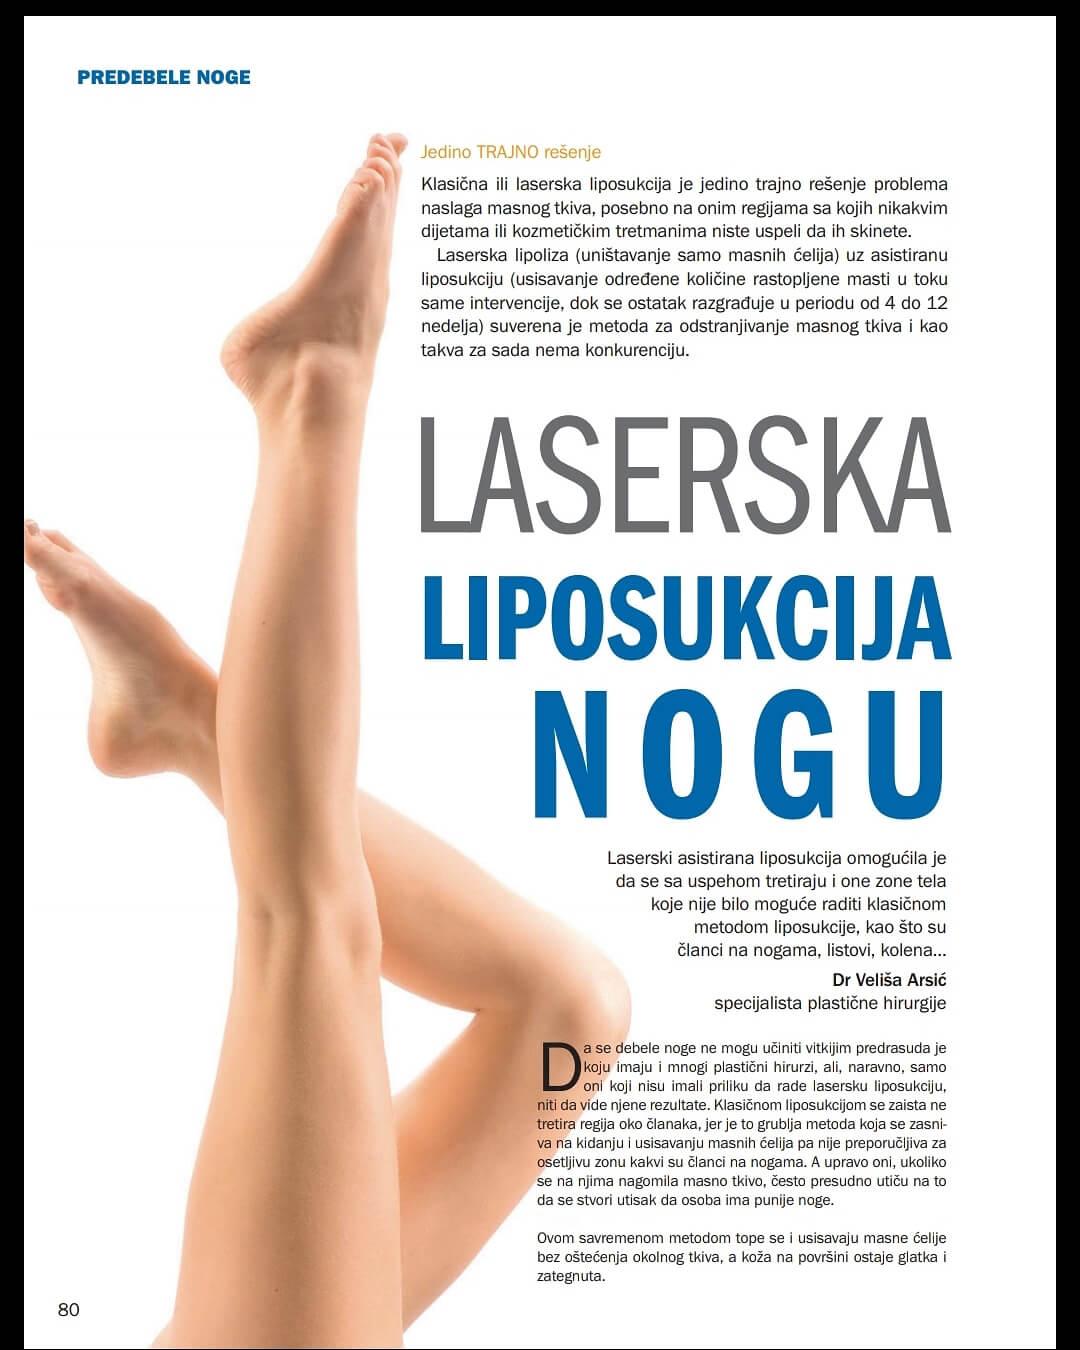 Laserska liposukcija nogu!